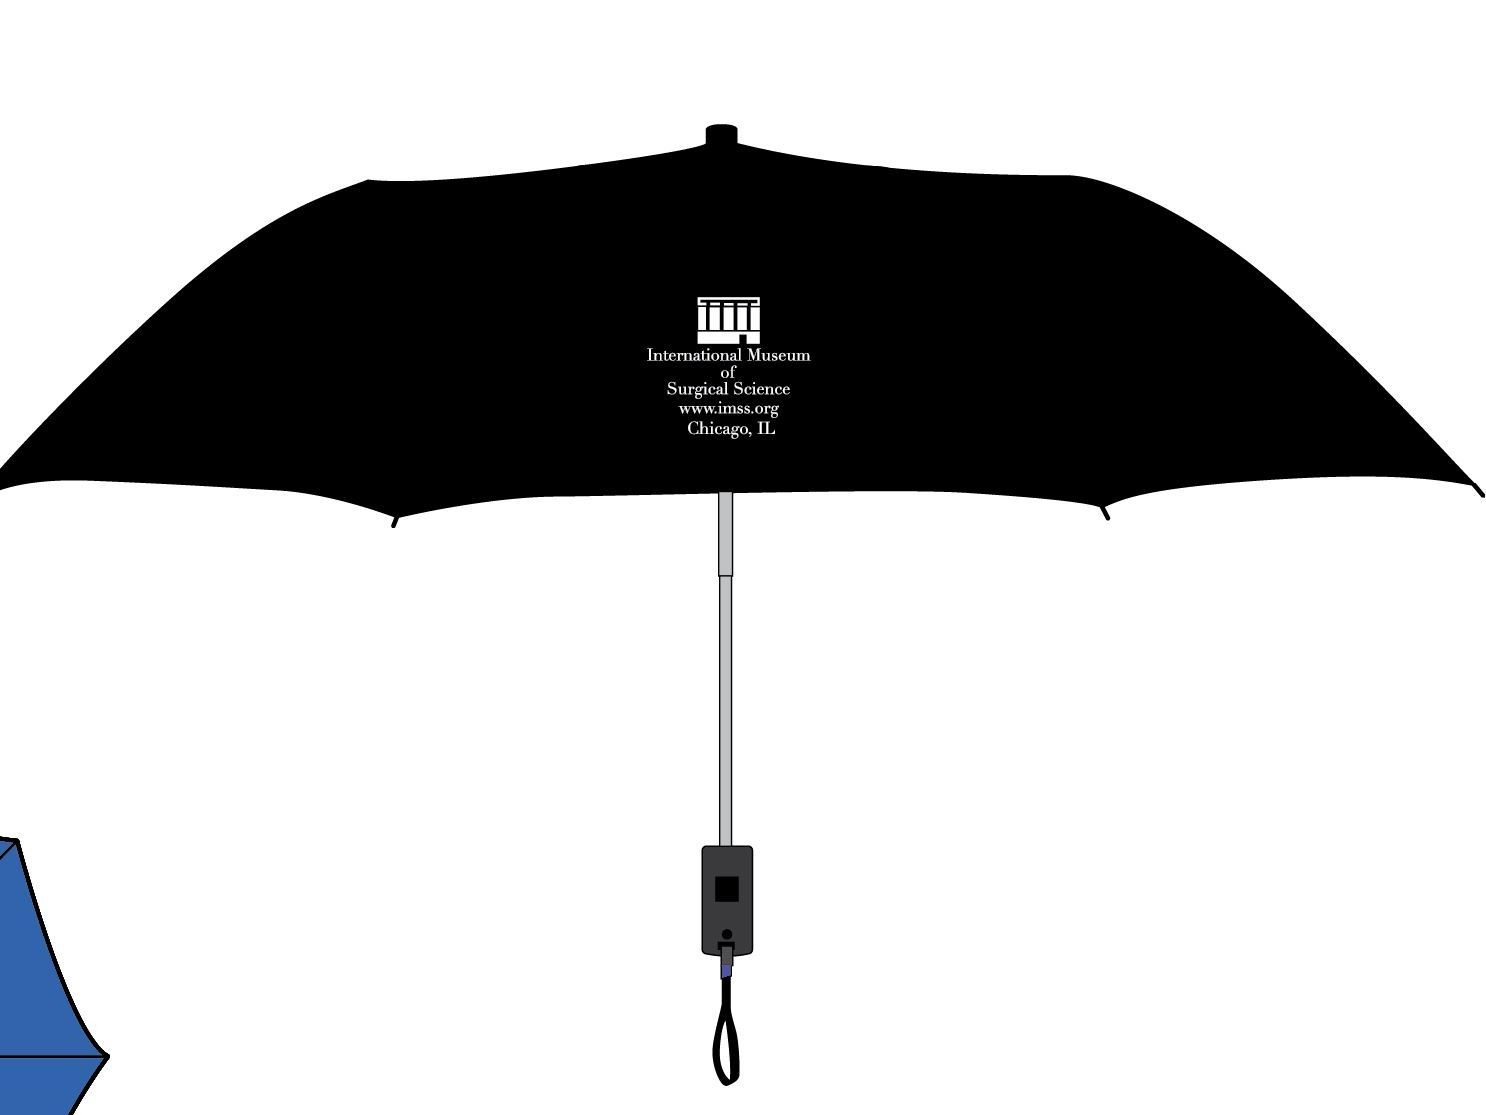 IMSS Umbrella